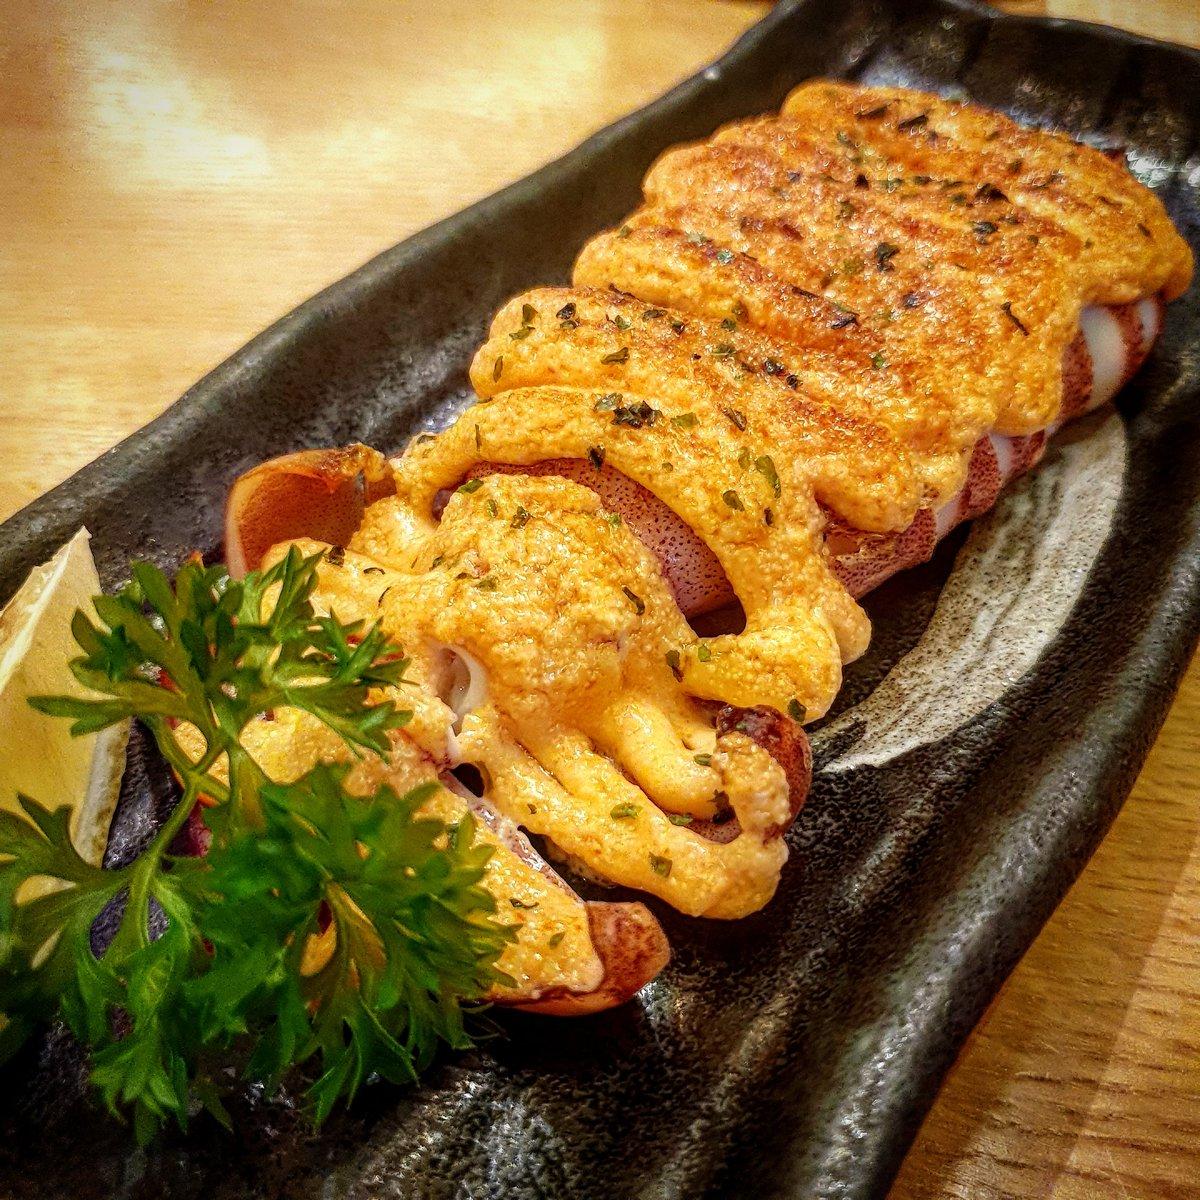 Ika Mentai   #sushitei #singapore #thomsonplaza #ikamentai #ika #mentai #sotong #squid #japanesefood #tastetest #dexperience #niceornot #sub4sub #subforsub